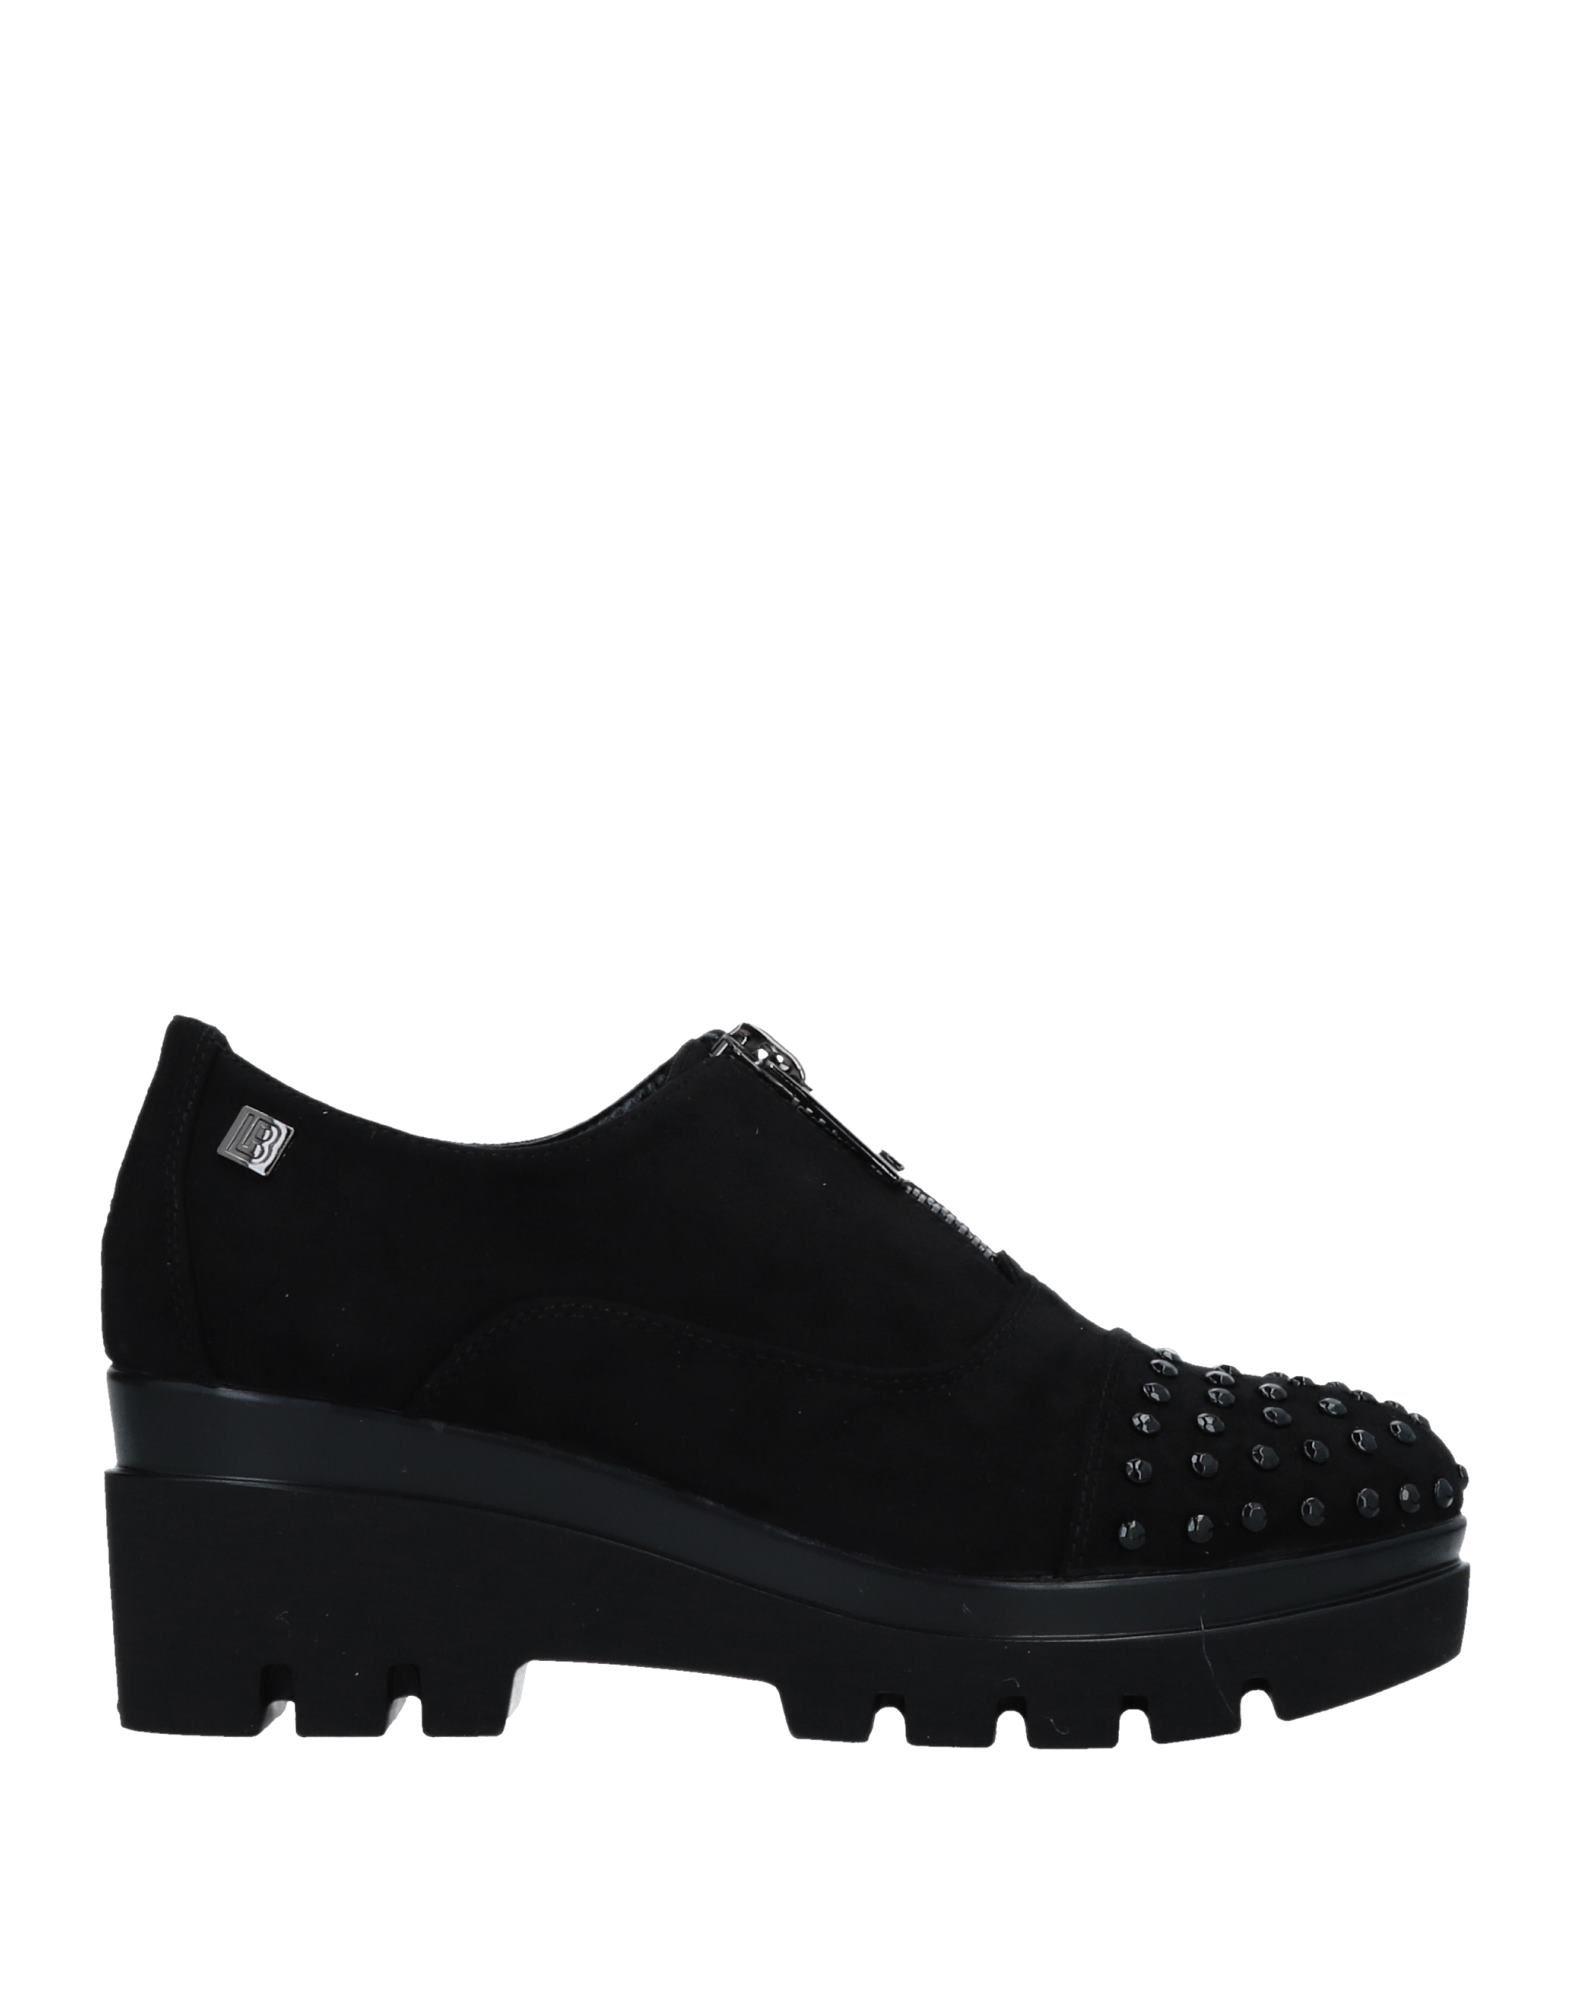 Laura Biagiotti Mokassins Damen  11505822VK Gute Qualität beliebte Schuhe